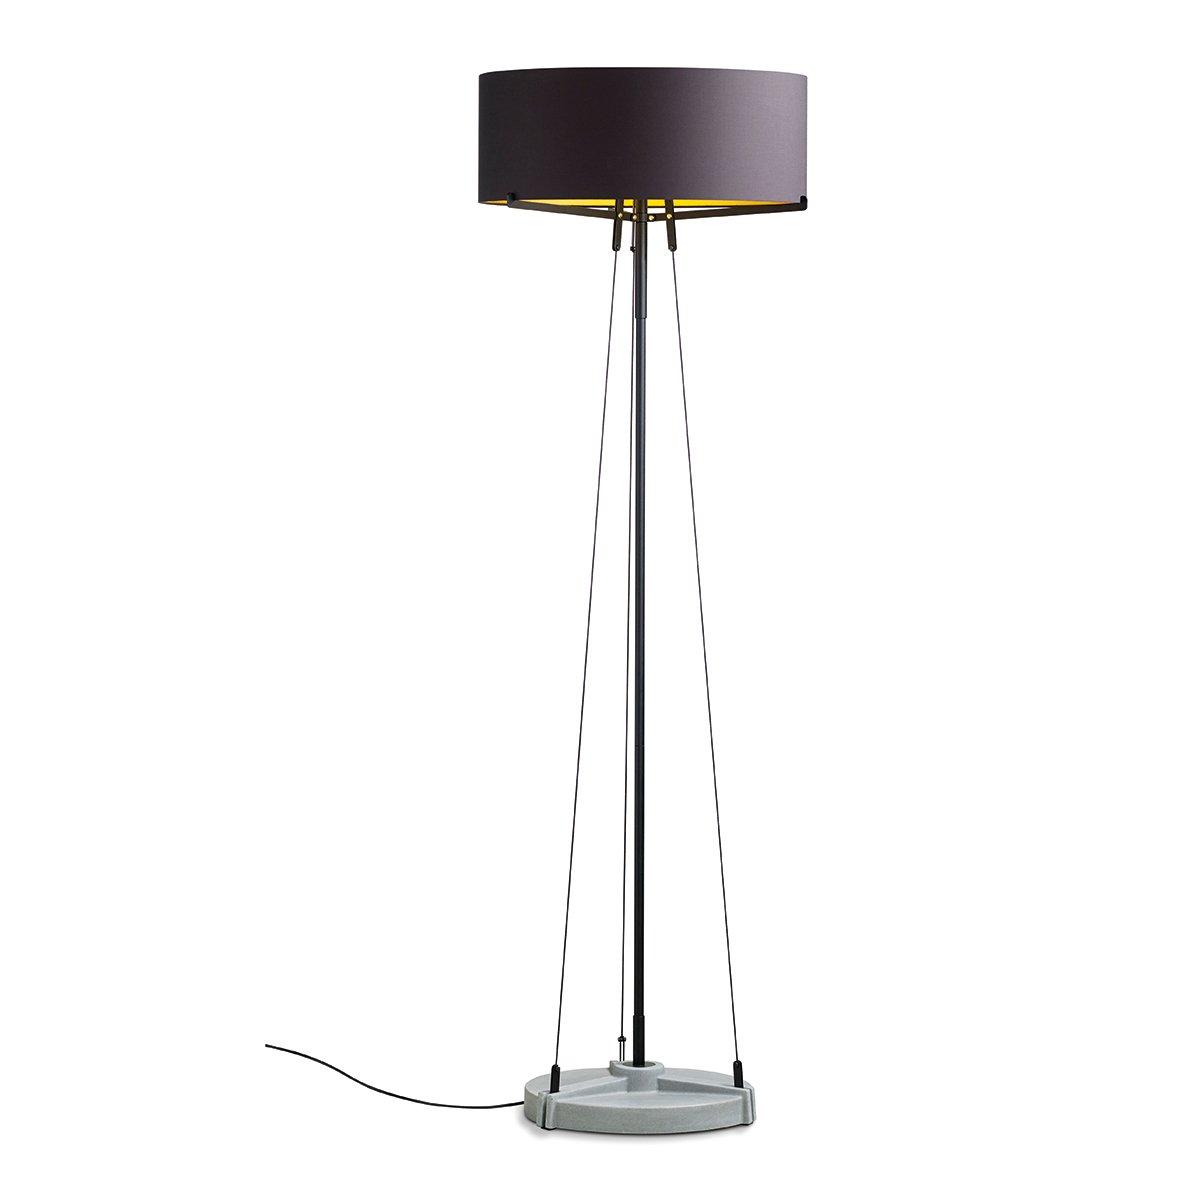 Tonone Orbit Vloerlamp - Dutch Design Anton de Groof